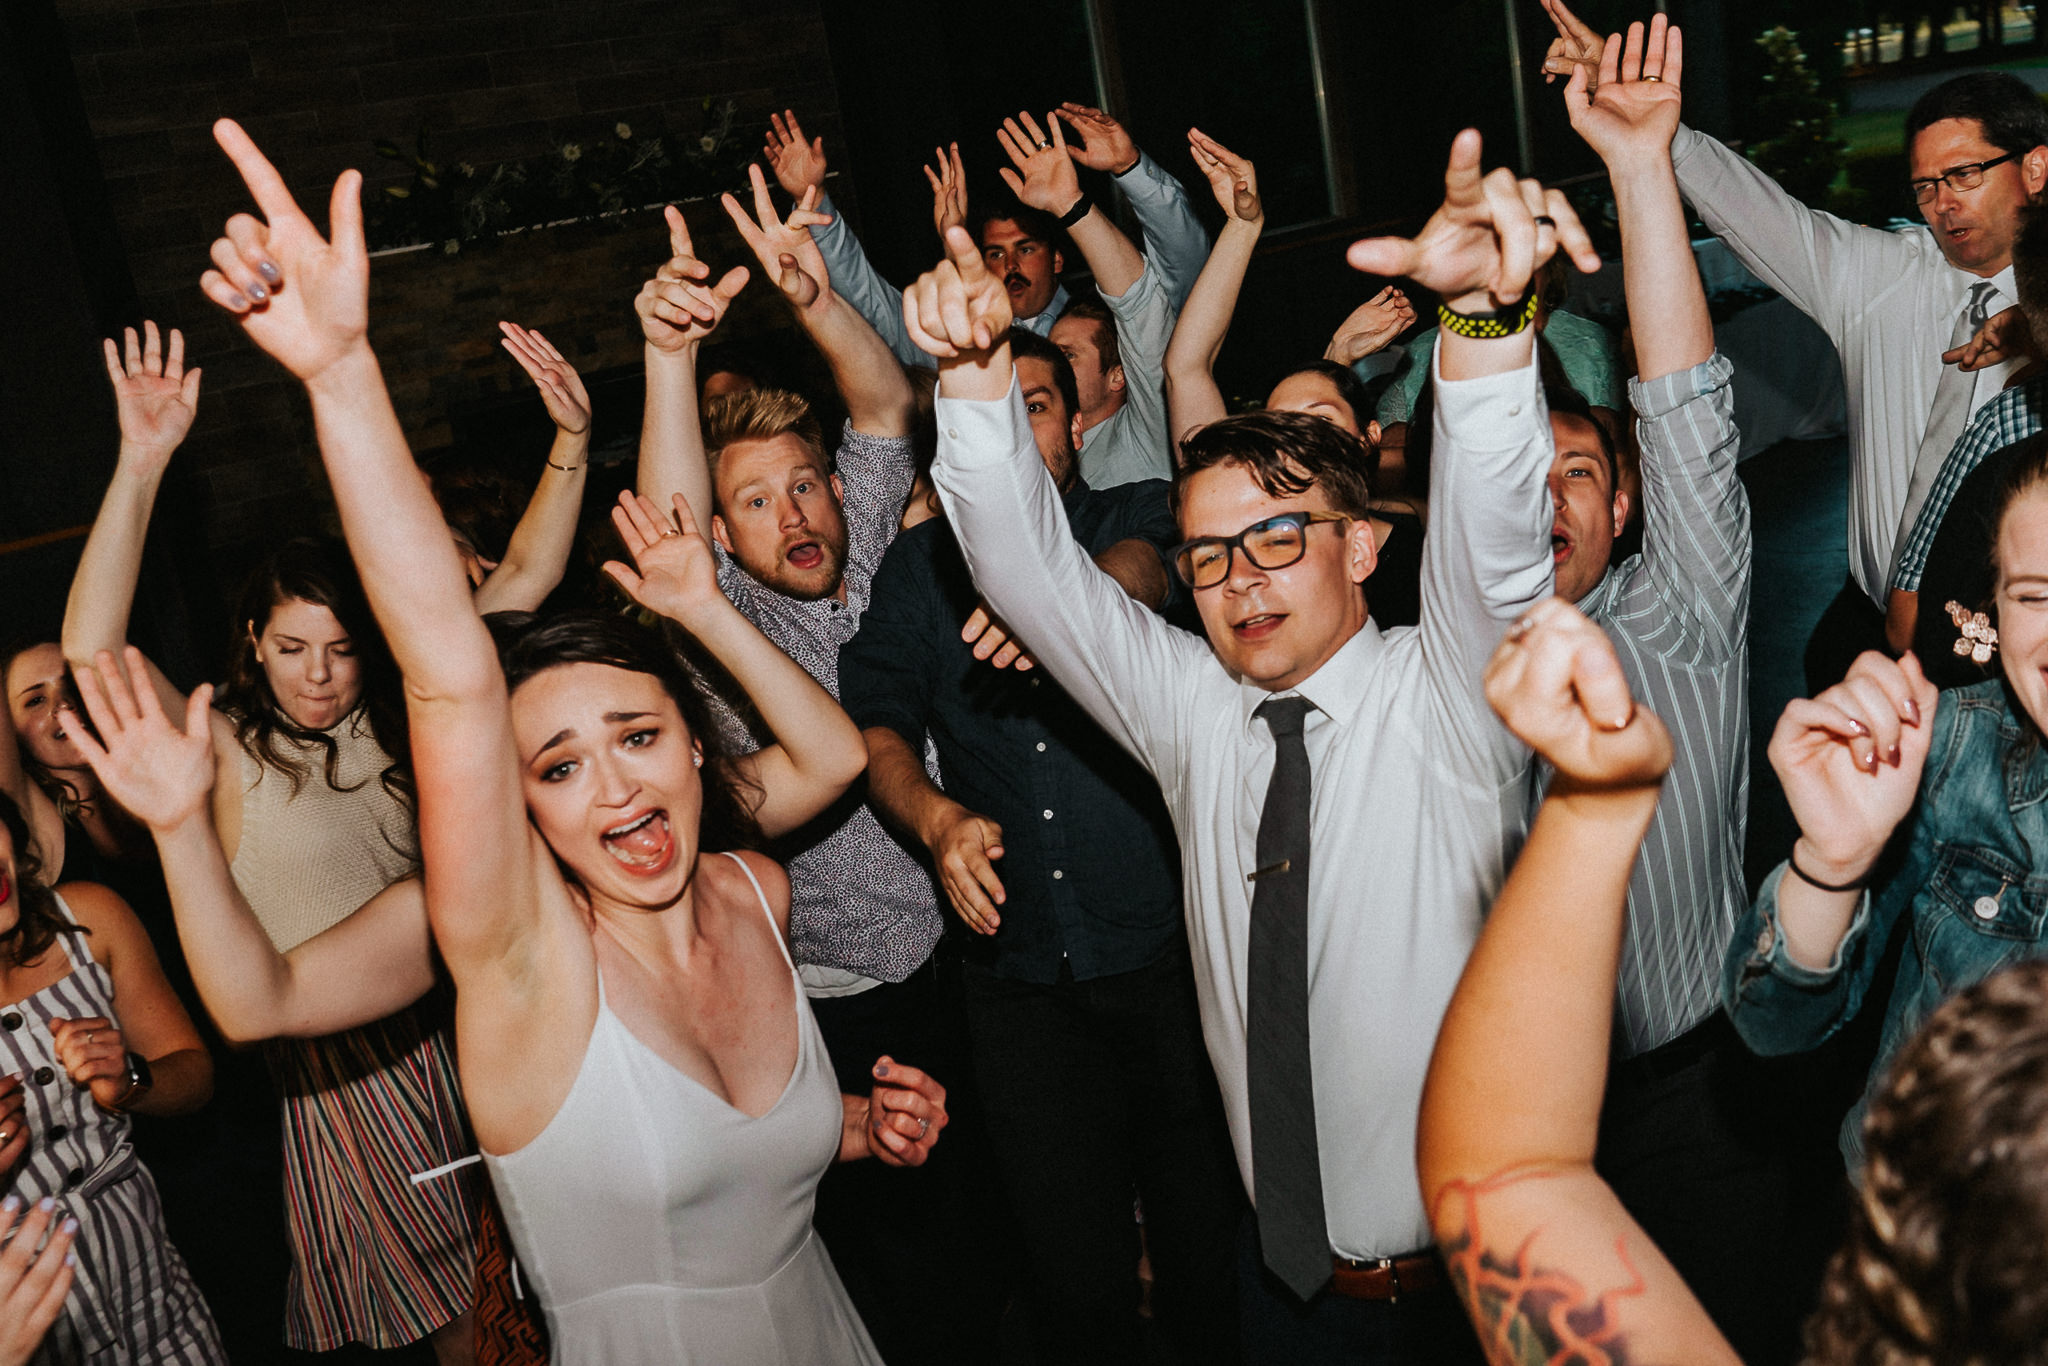 Bride groom Reception dance party Water Oasis pantsuit